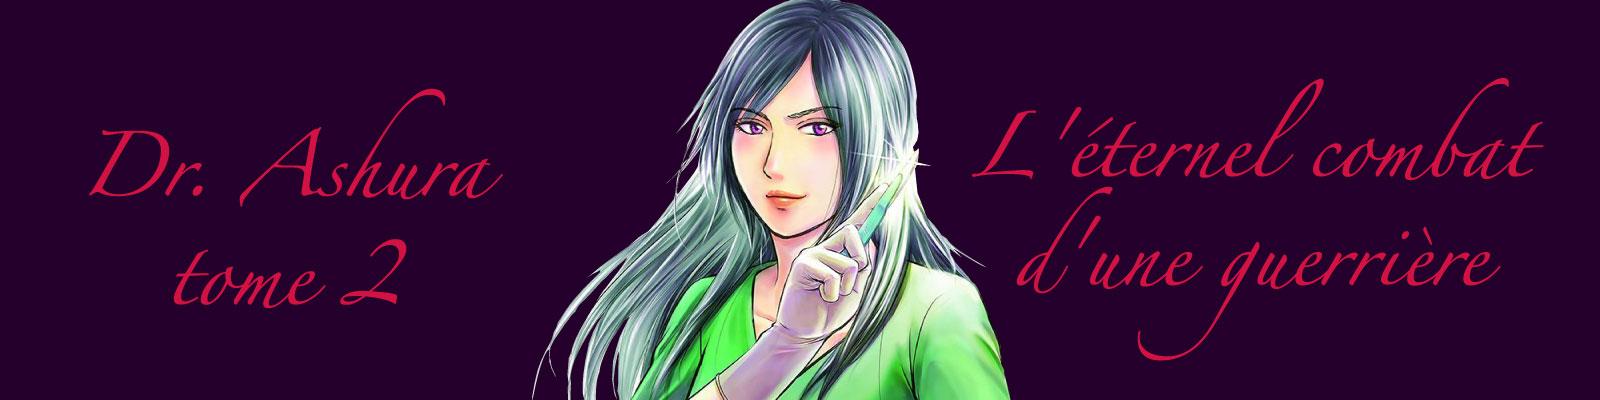 Dr.-Ashura